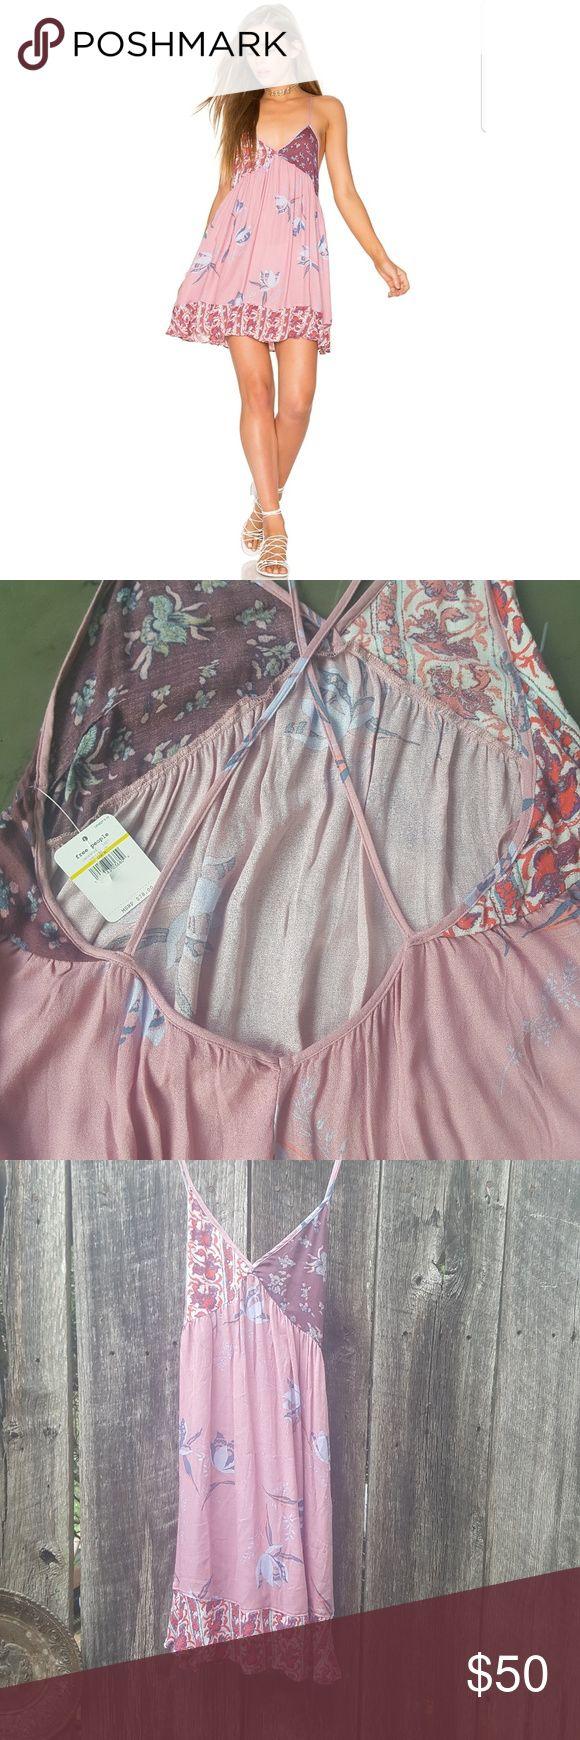 Free People NWT GOREGOUS neutrals slip dress Beautiful NWT festival perfect!!! Free People Dresses